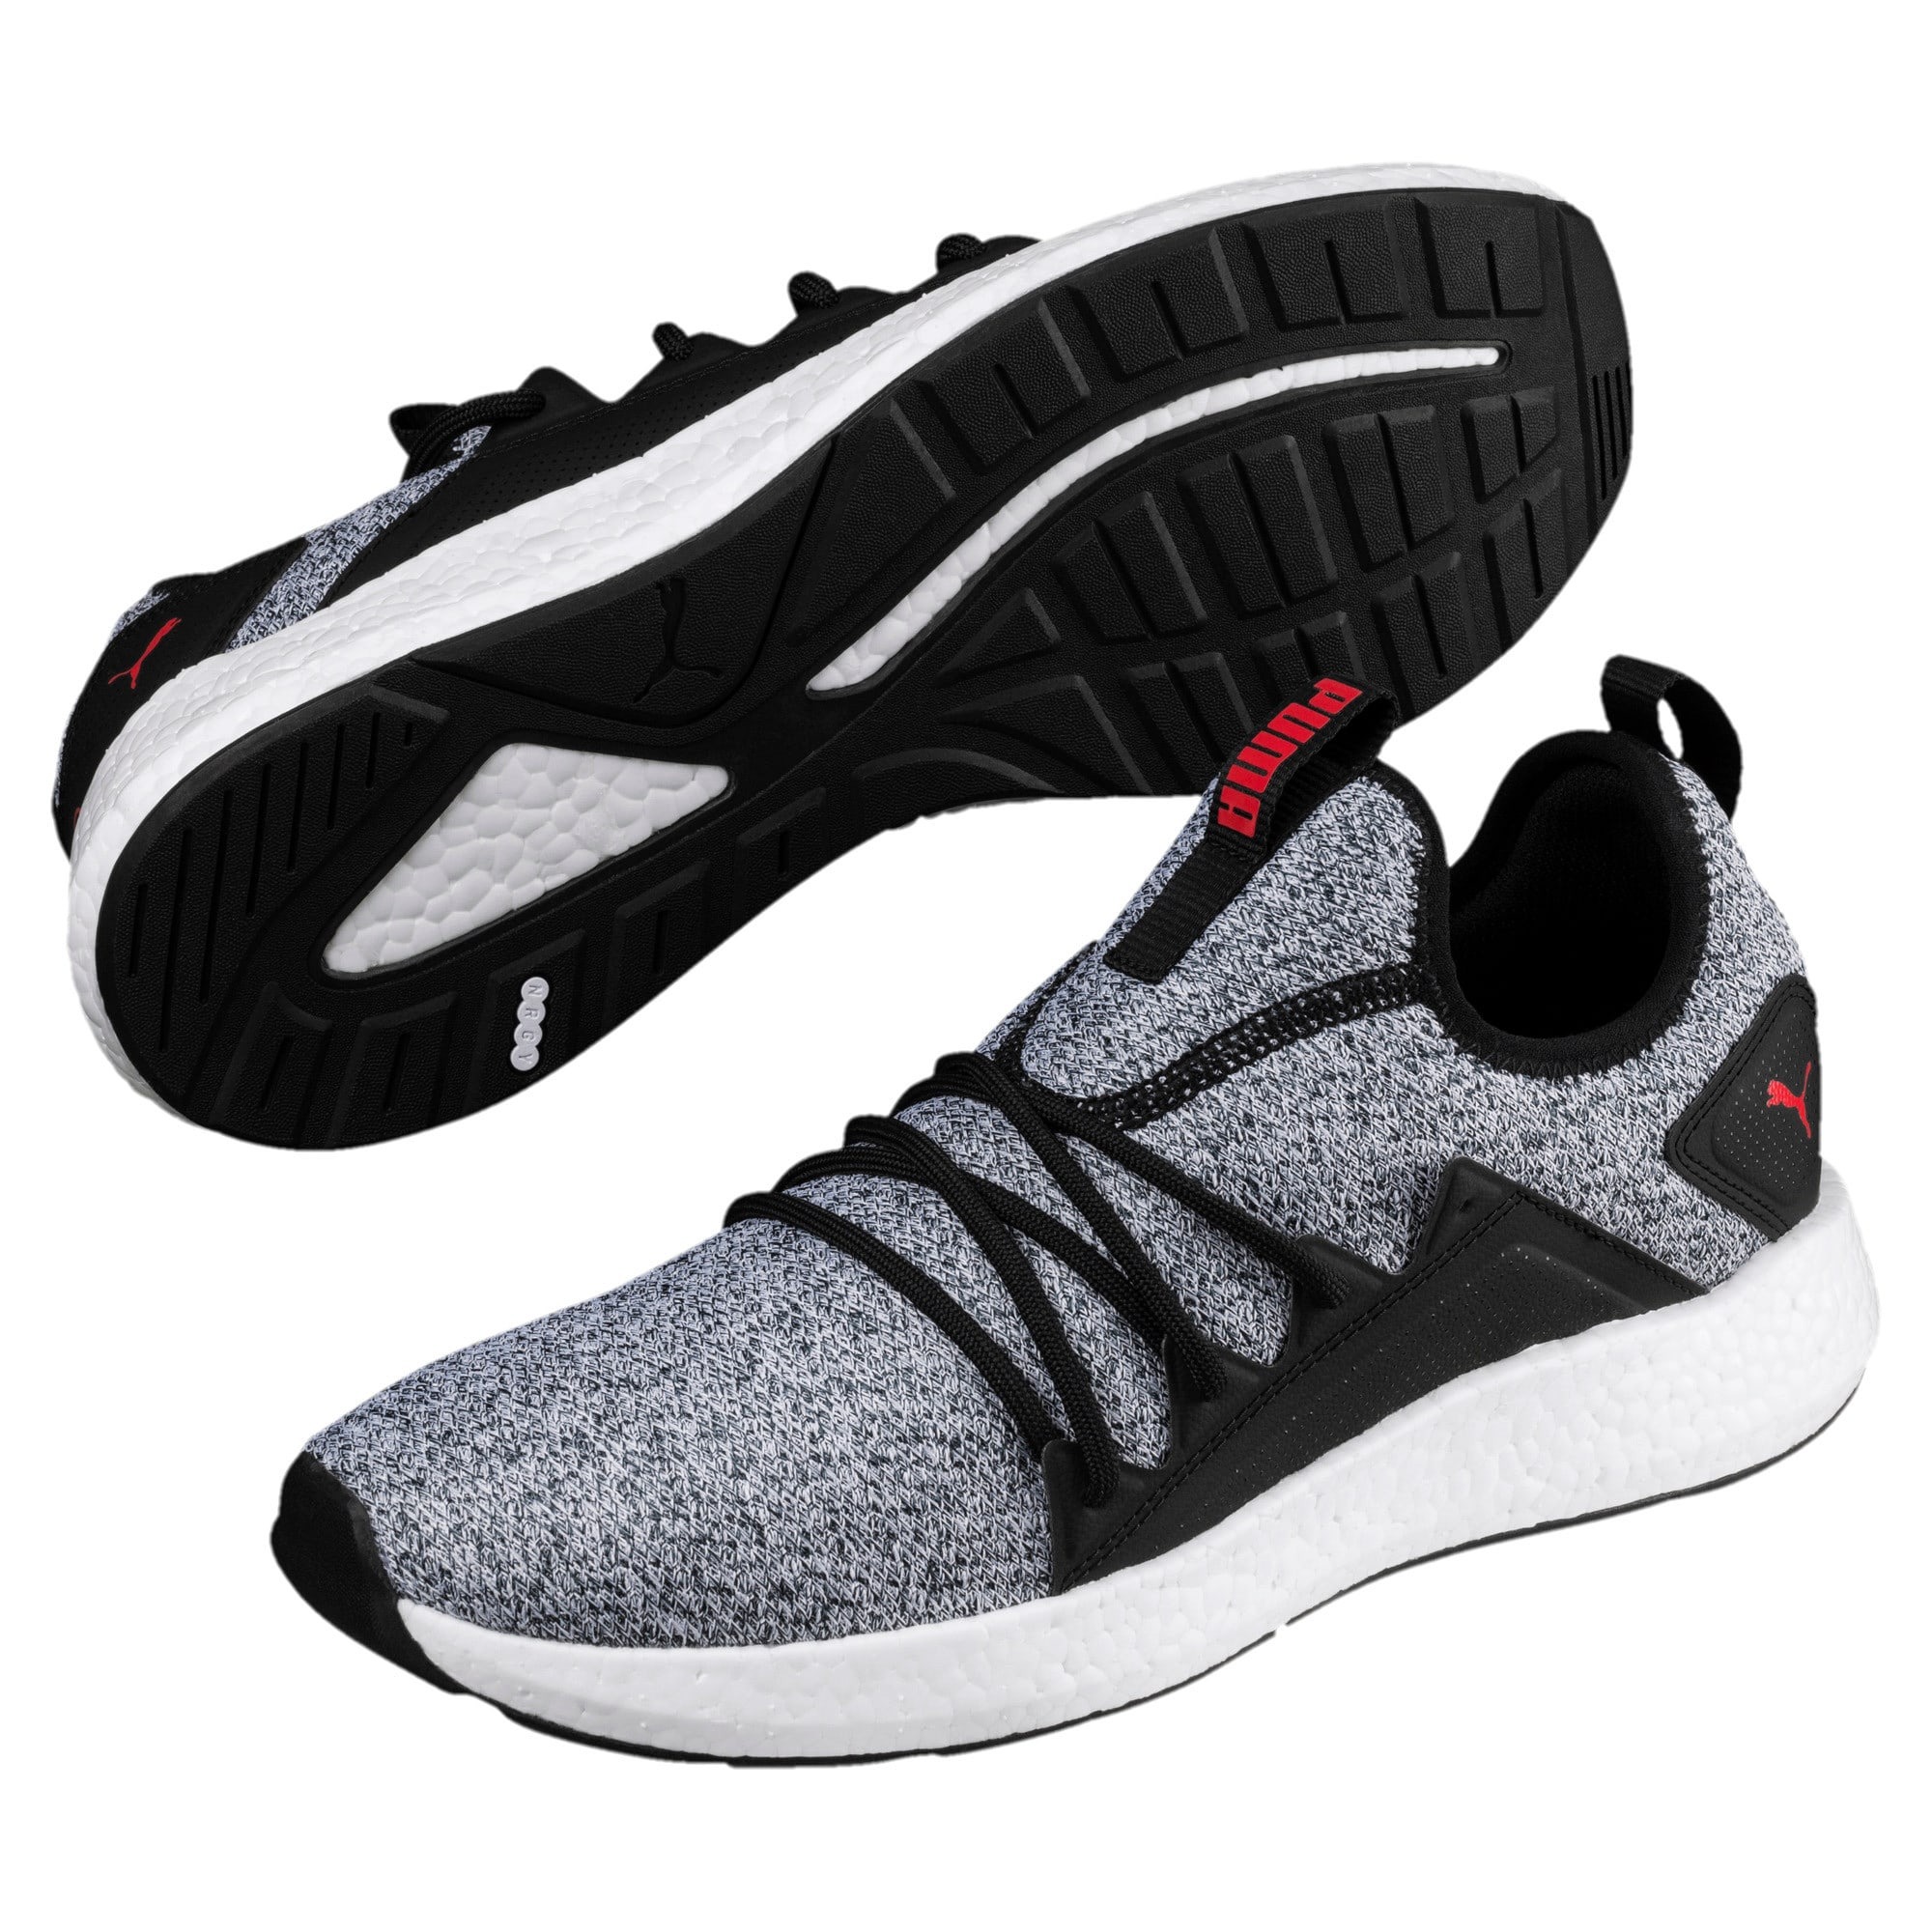 Thumbnail 2 of NRGY Neko Knit Men's Running Shoes, Puma Black-High Risk Red, medium